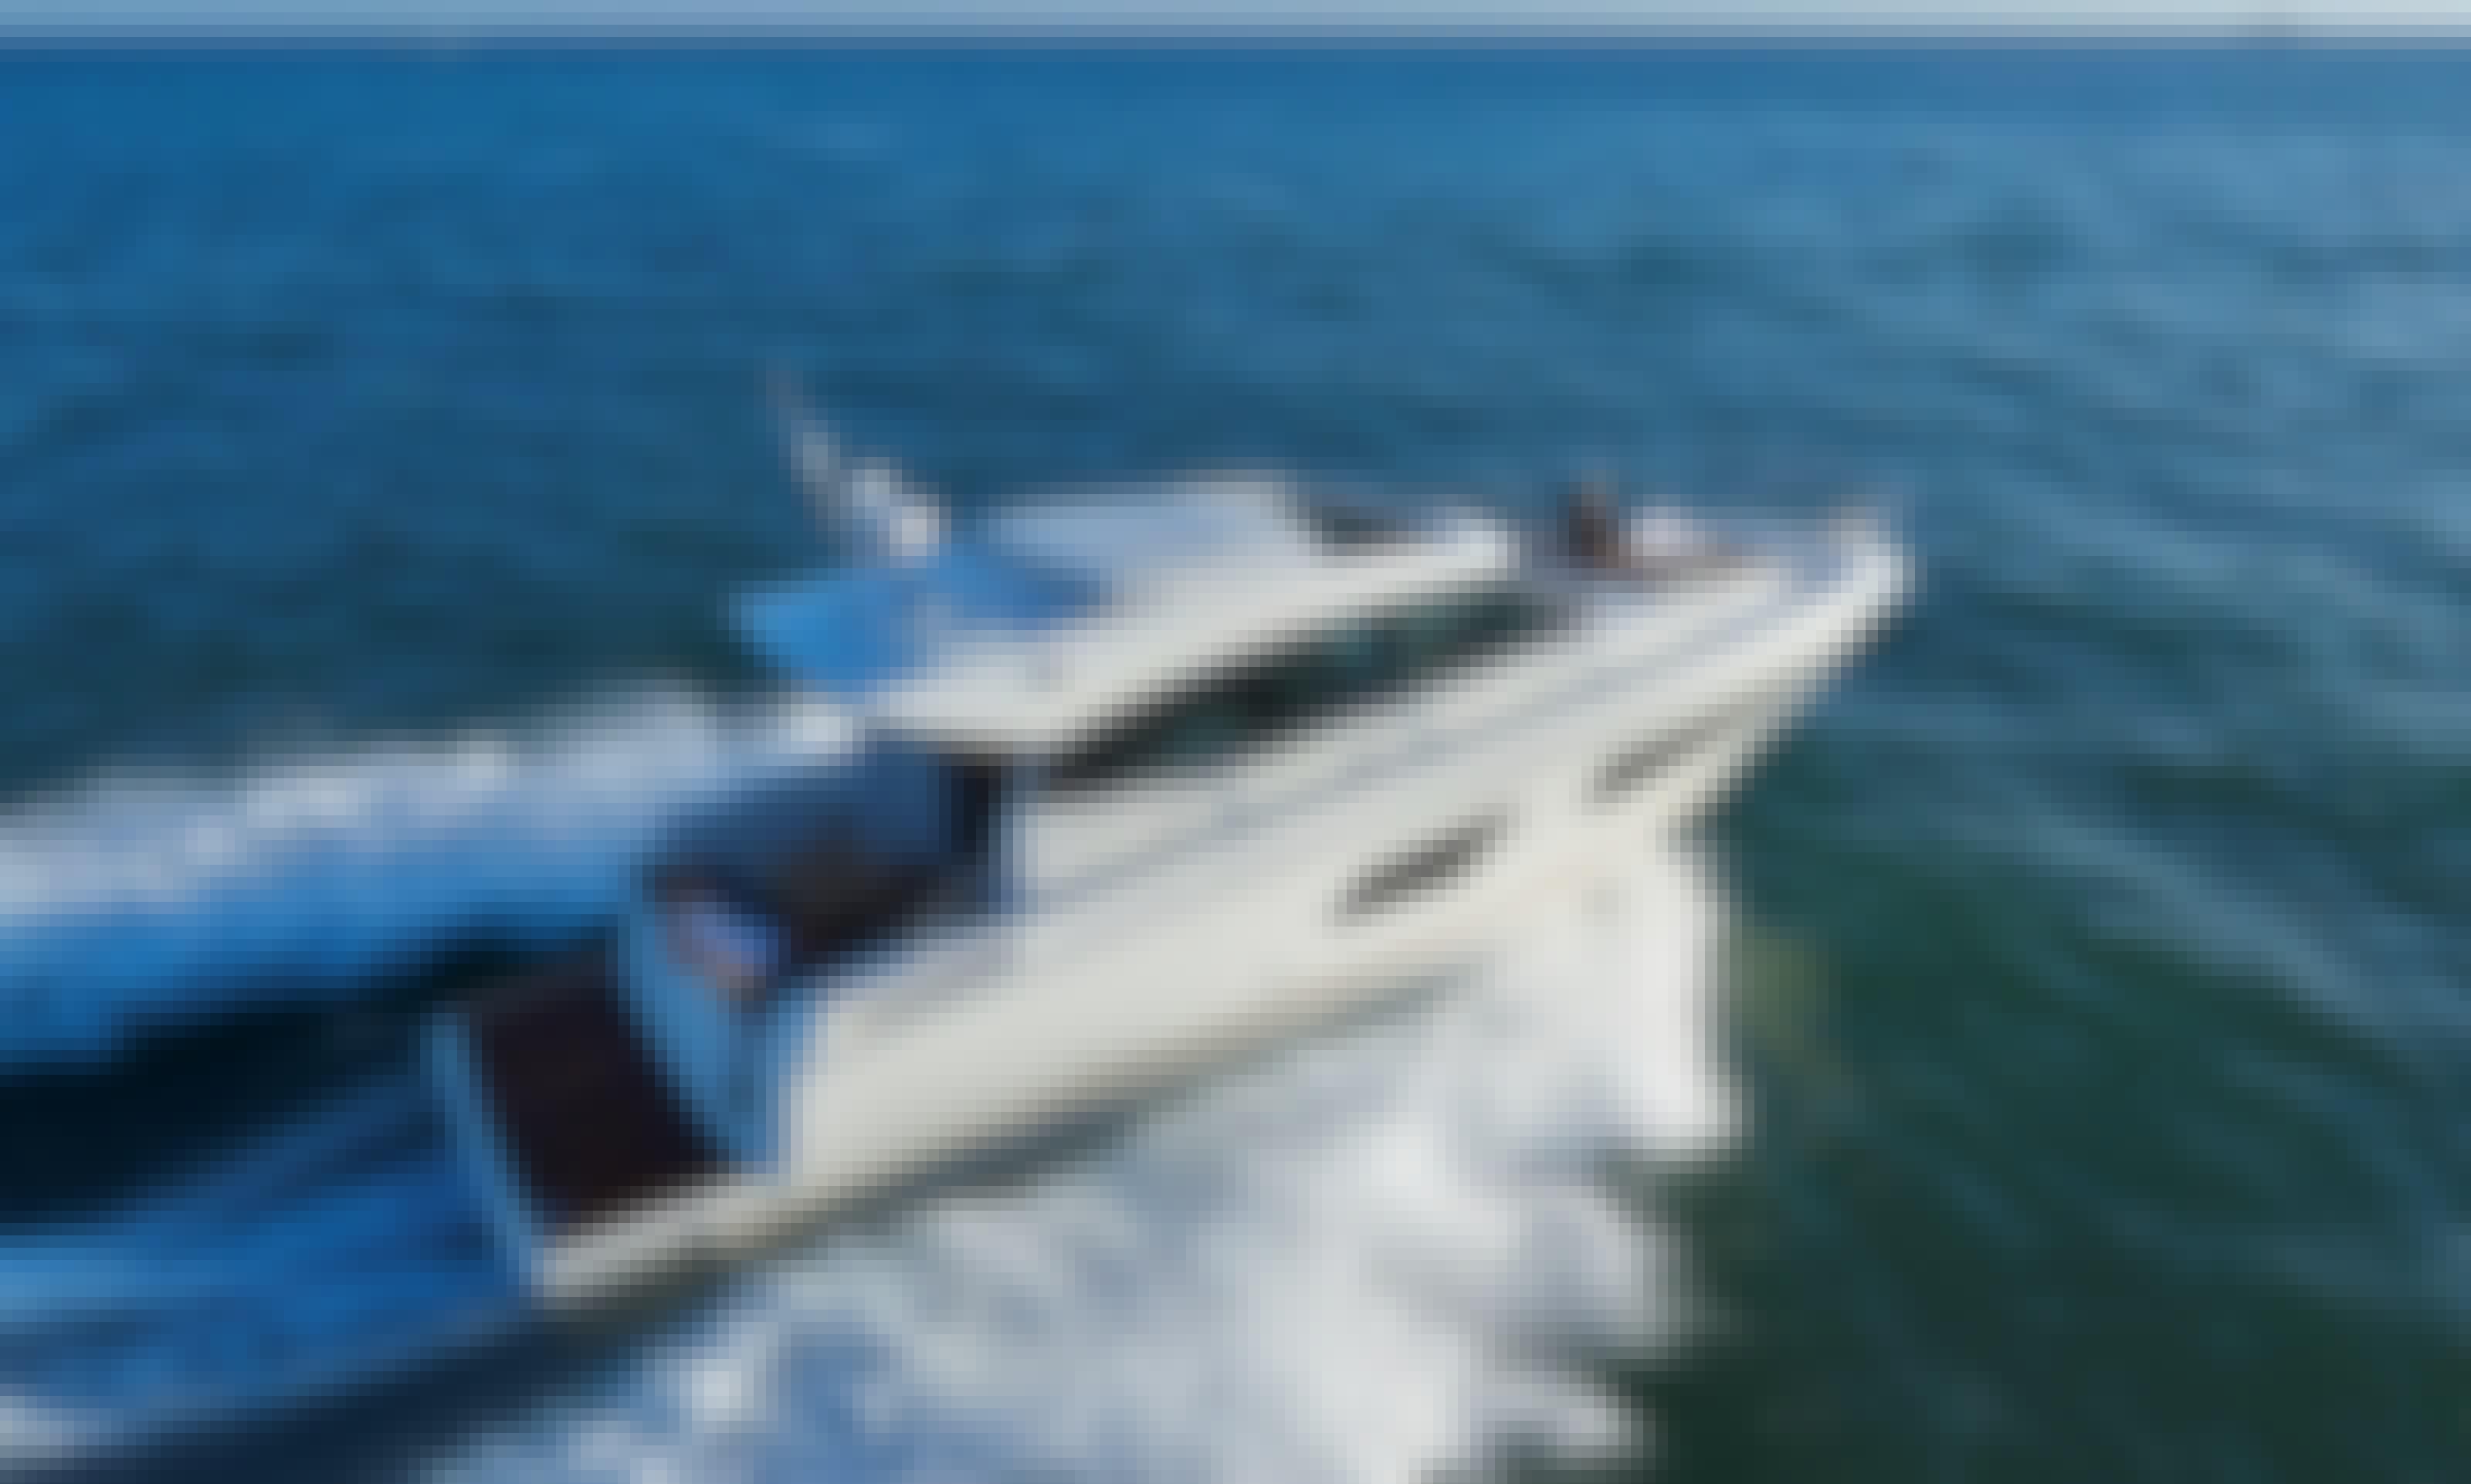 Prestige 420 S Motor Yacht Charter for 10 People in Ibiza, Spain